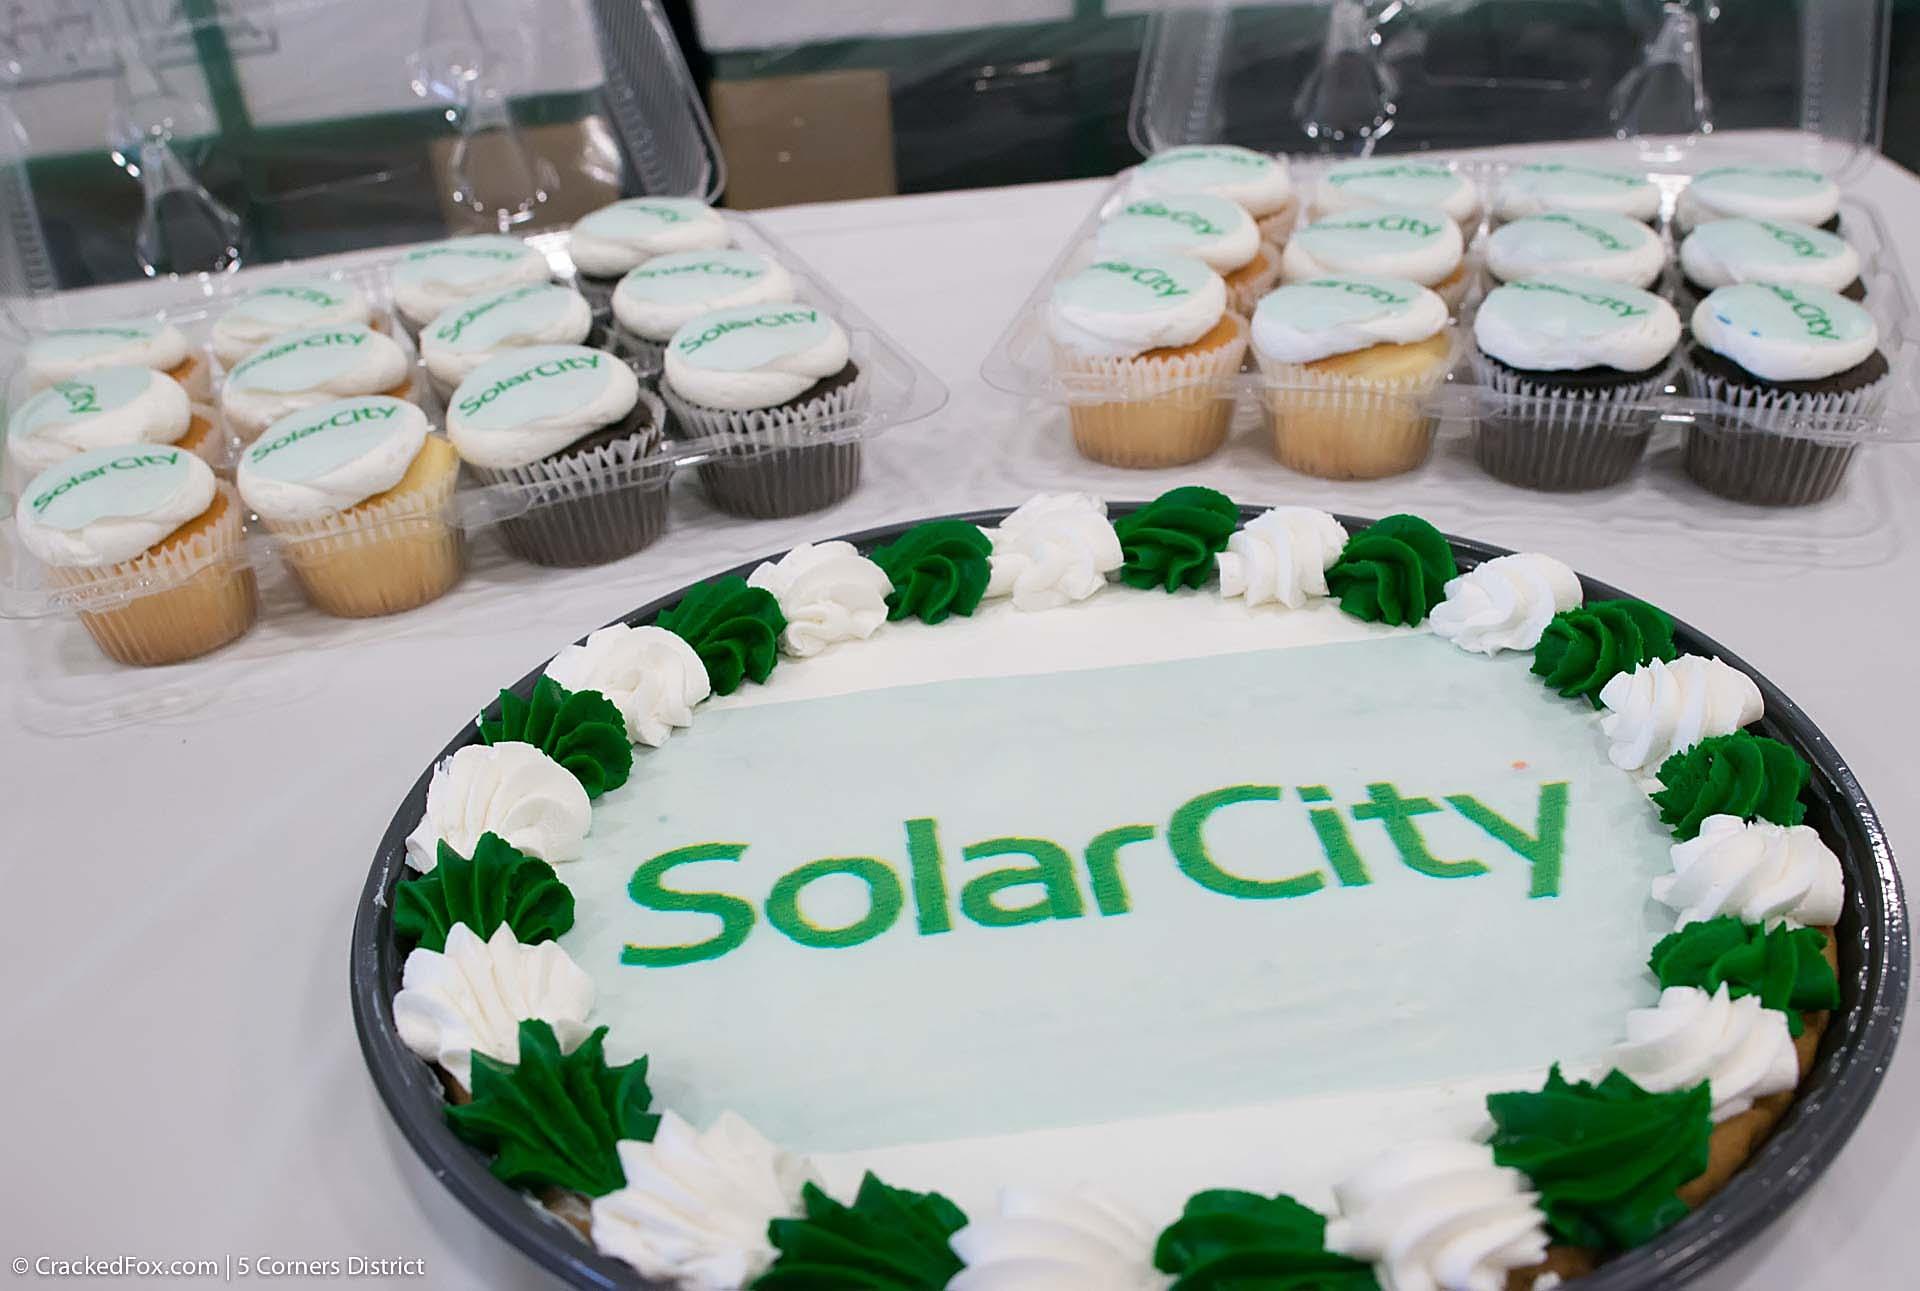 5cmd-2017-solarcity-0654